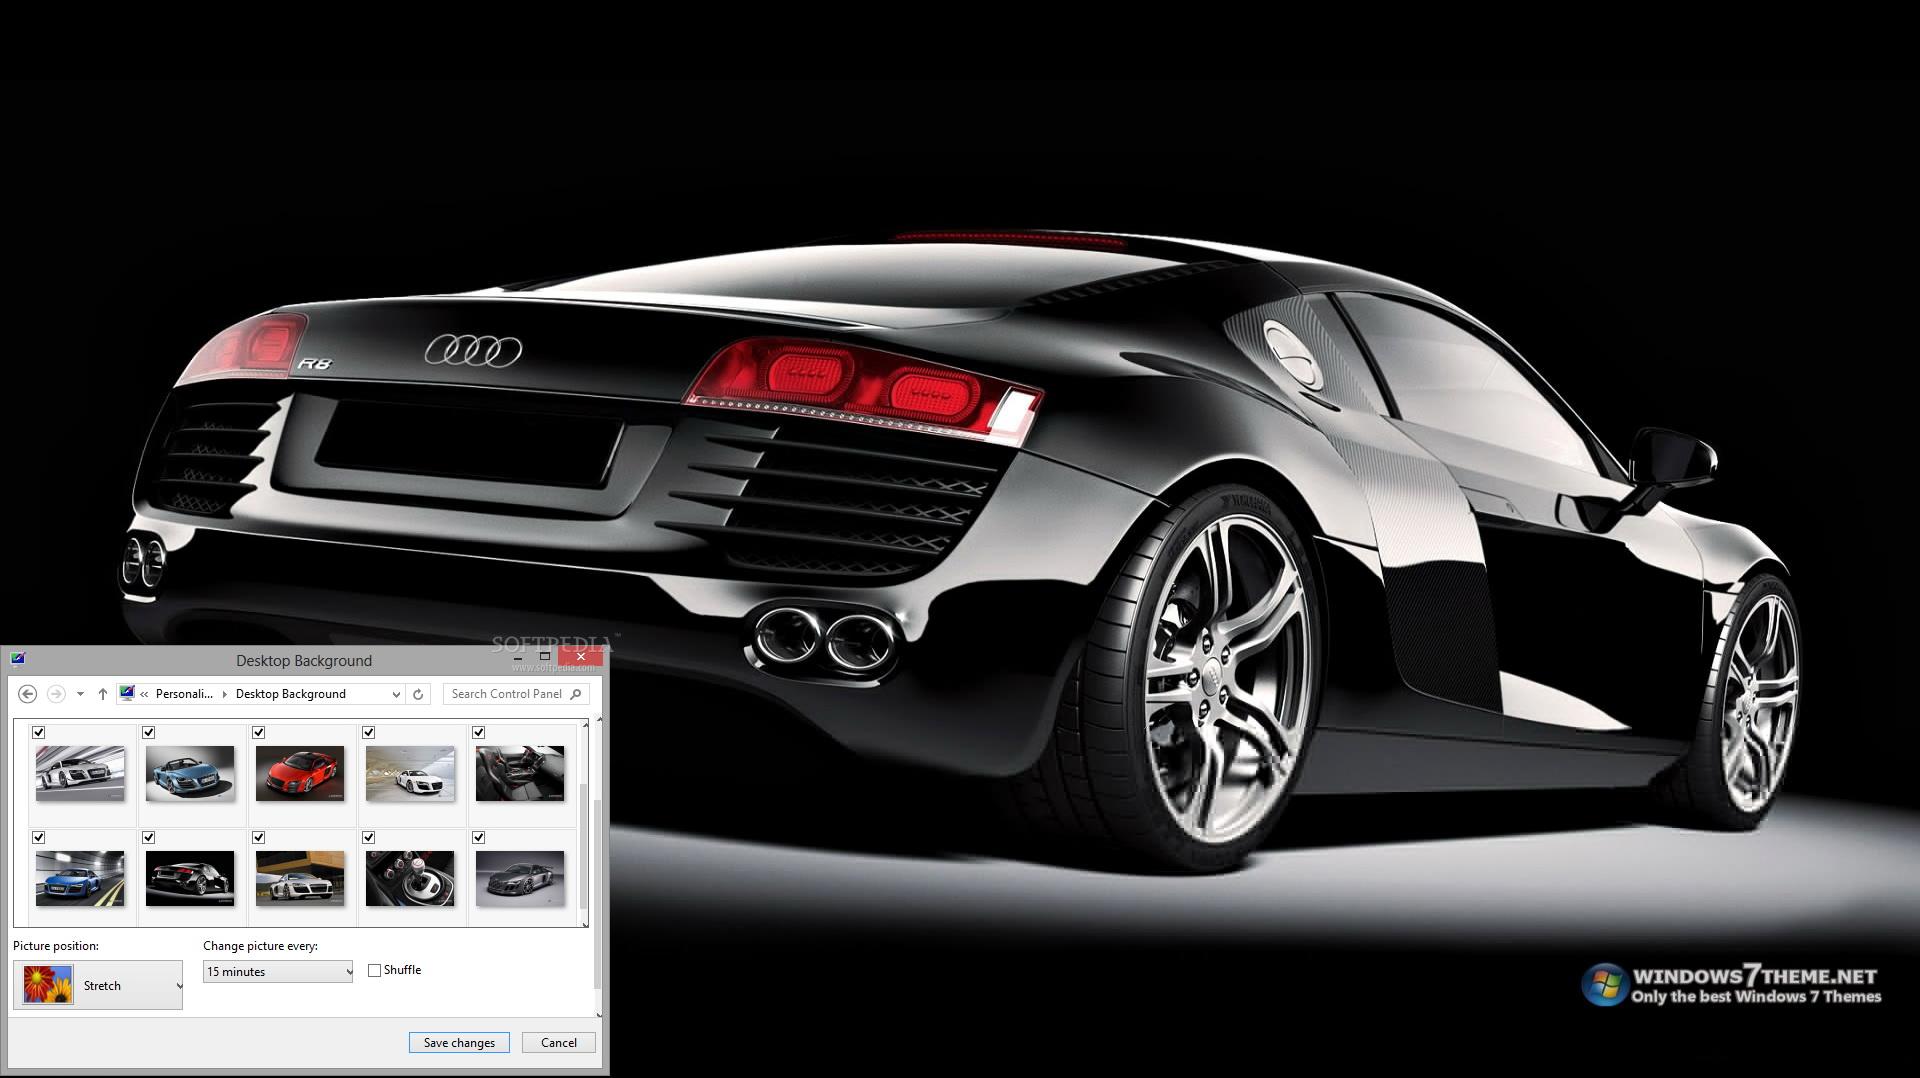 Audi R8 Windows 7 Theme